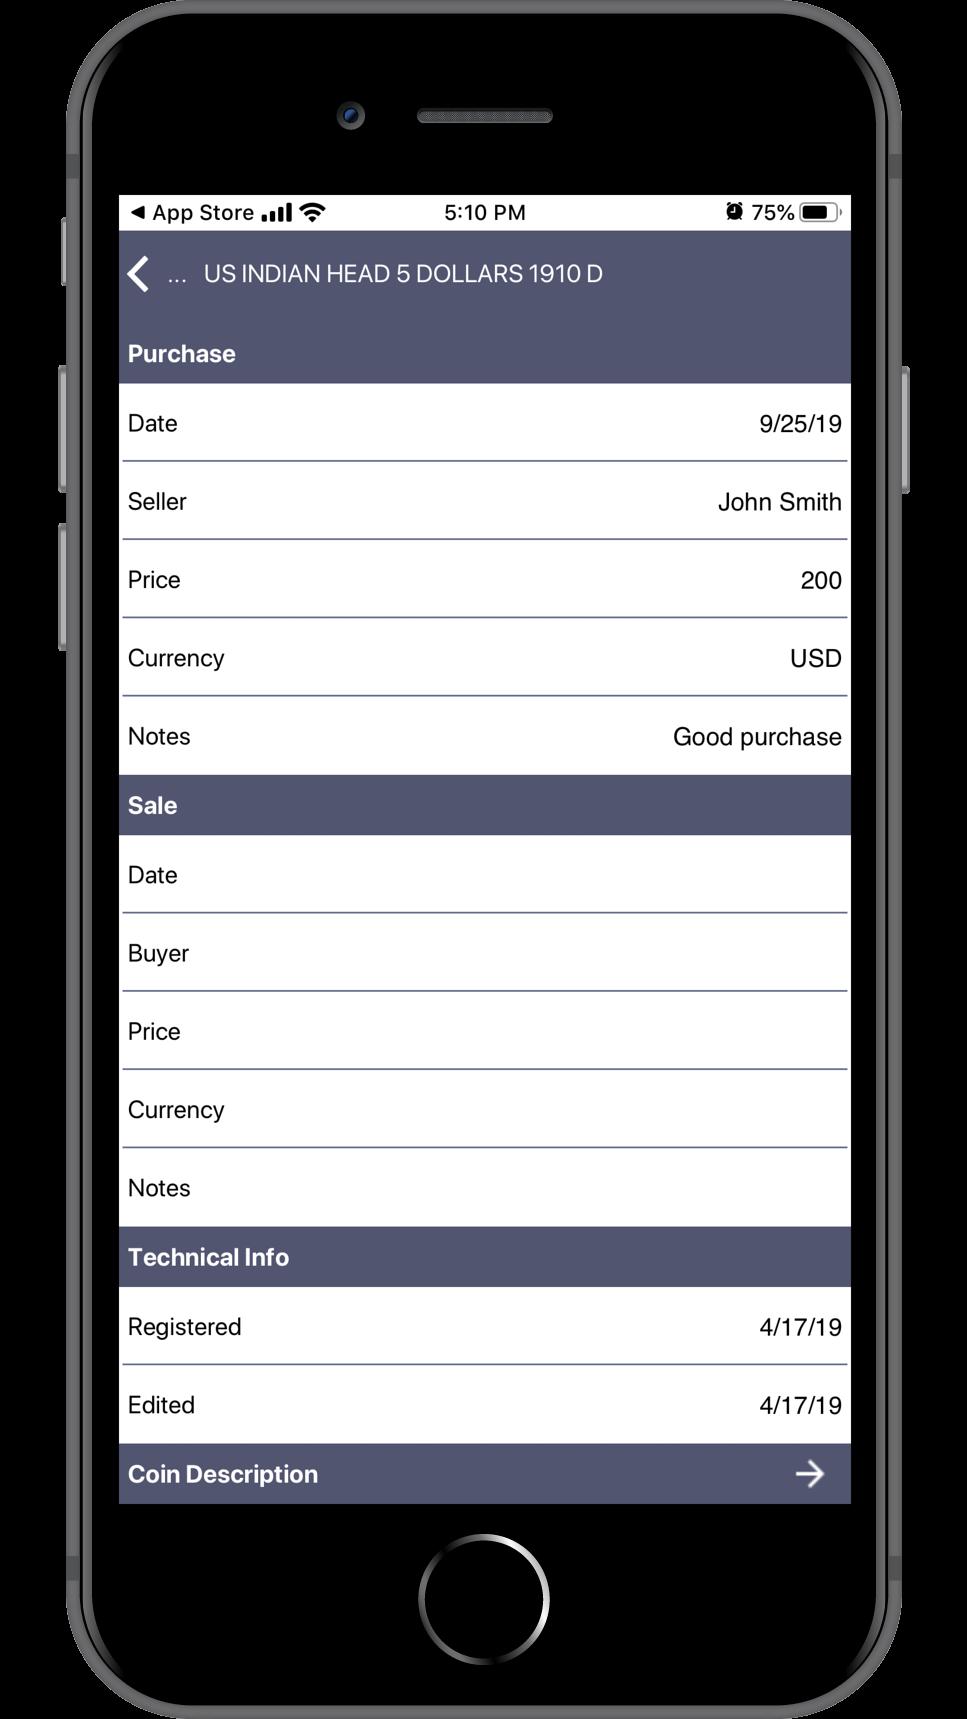 NUMISMATIST'S SAFE iOS APP. IOS 0